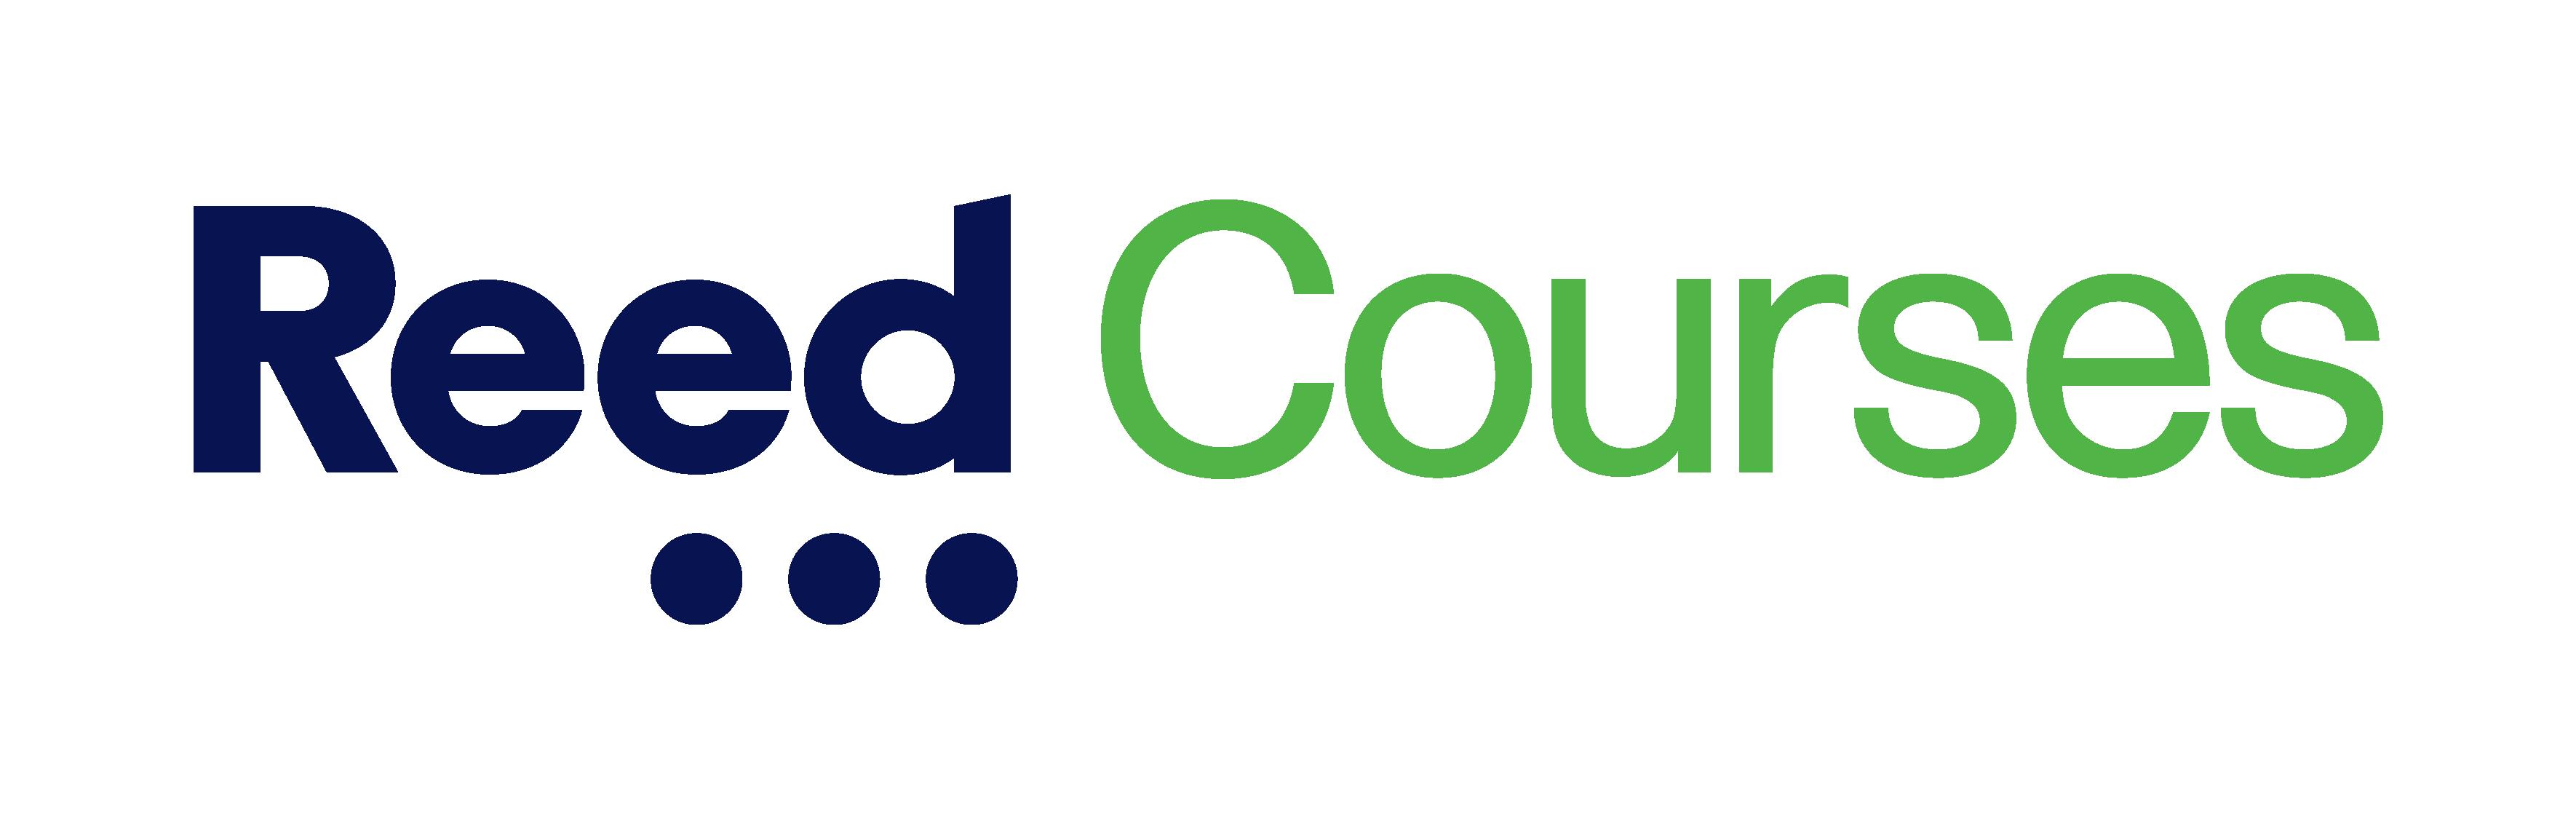 Reed Courses logo - blue and green horizontal logo